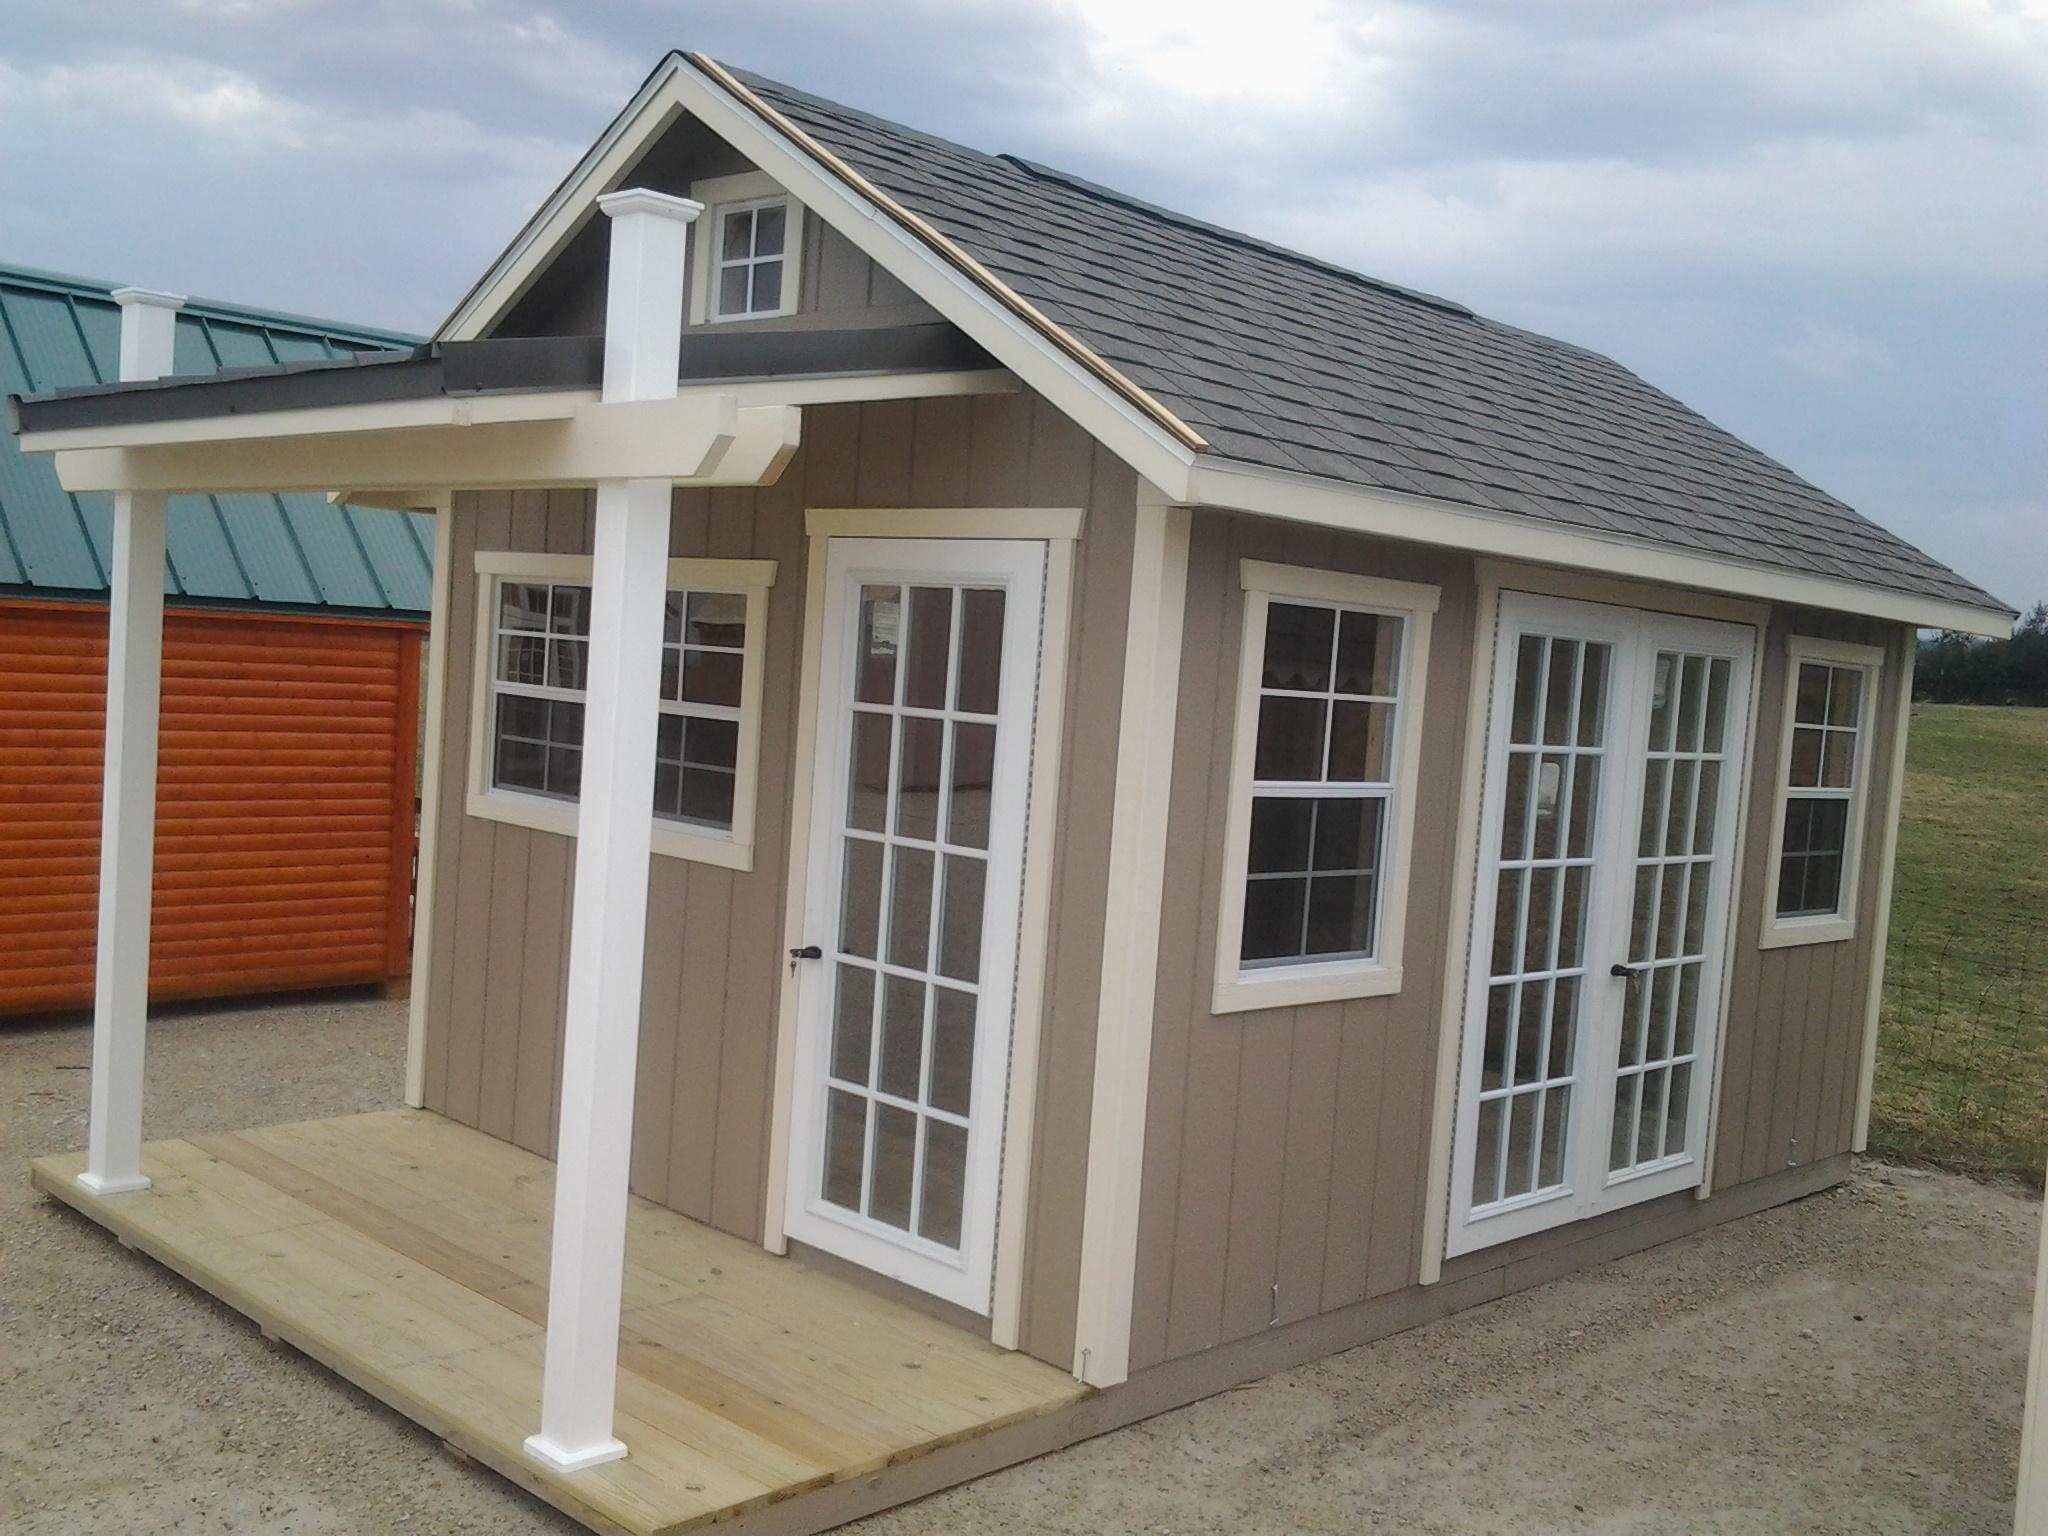 10x16 Garden Shed W Porch